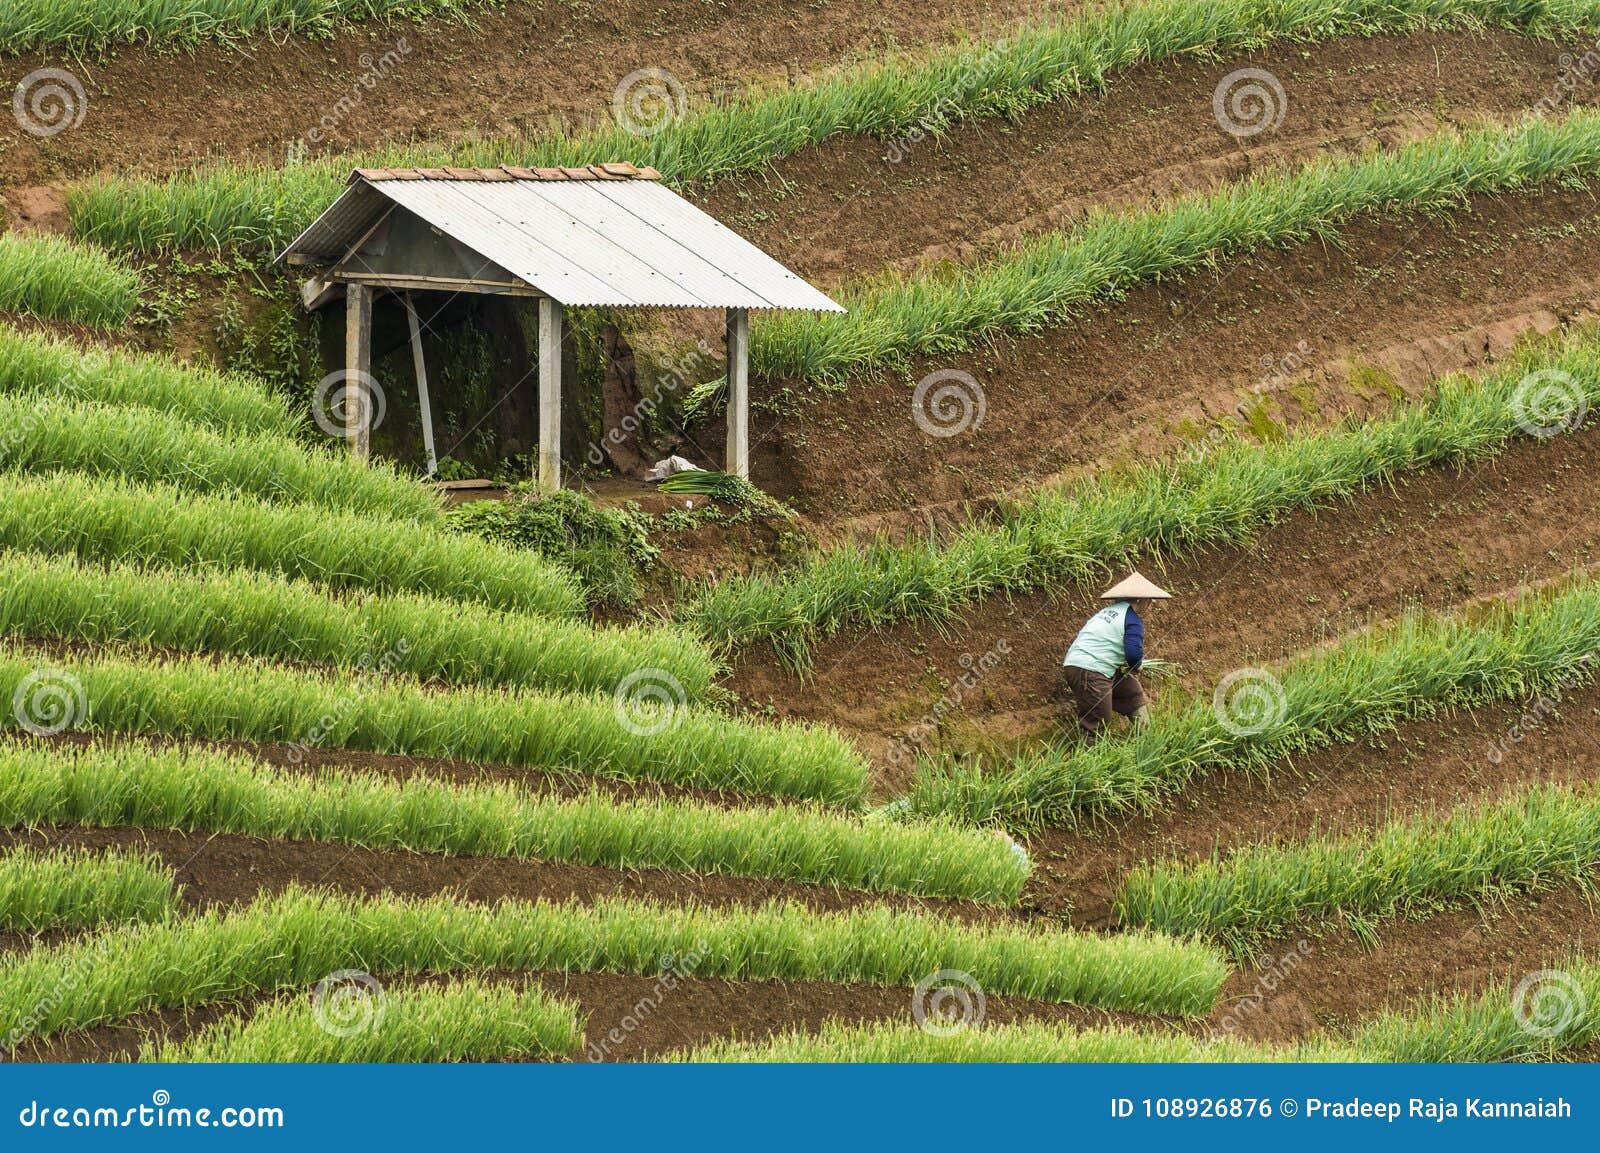 Argapura Ινδονησία 2018: Farmer που λειτουργεί στη φυτεία κρεμμυδιών τους το πρωί μετά από την ανατολή, δυτική Ιάβα, Ινδονησία